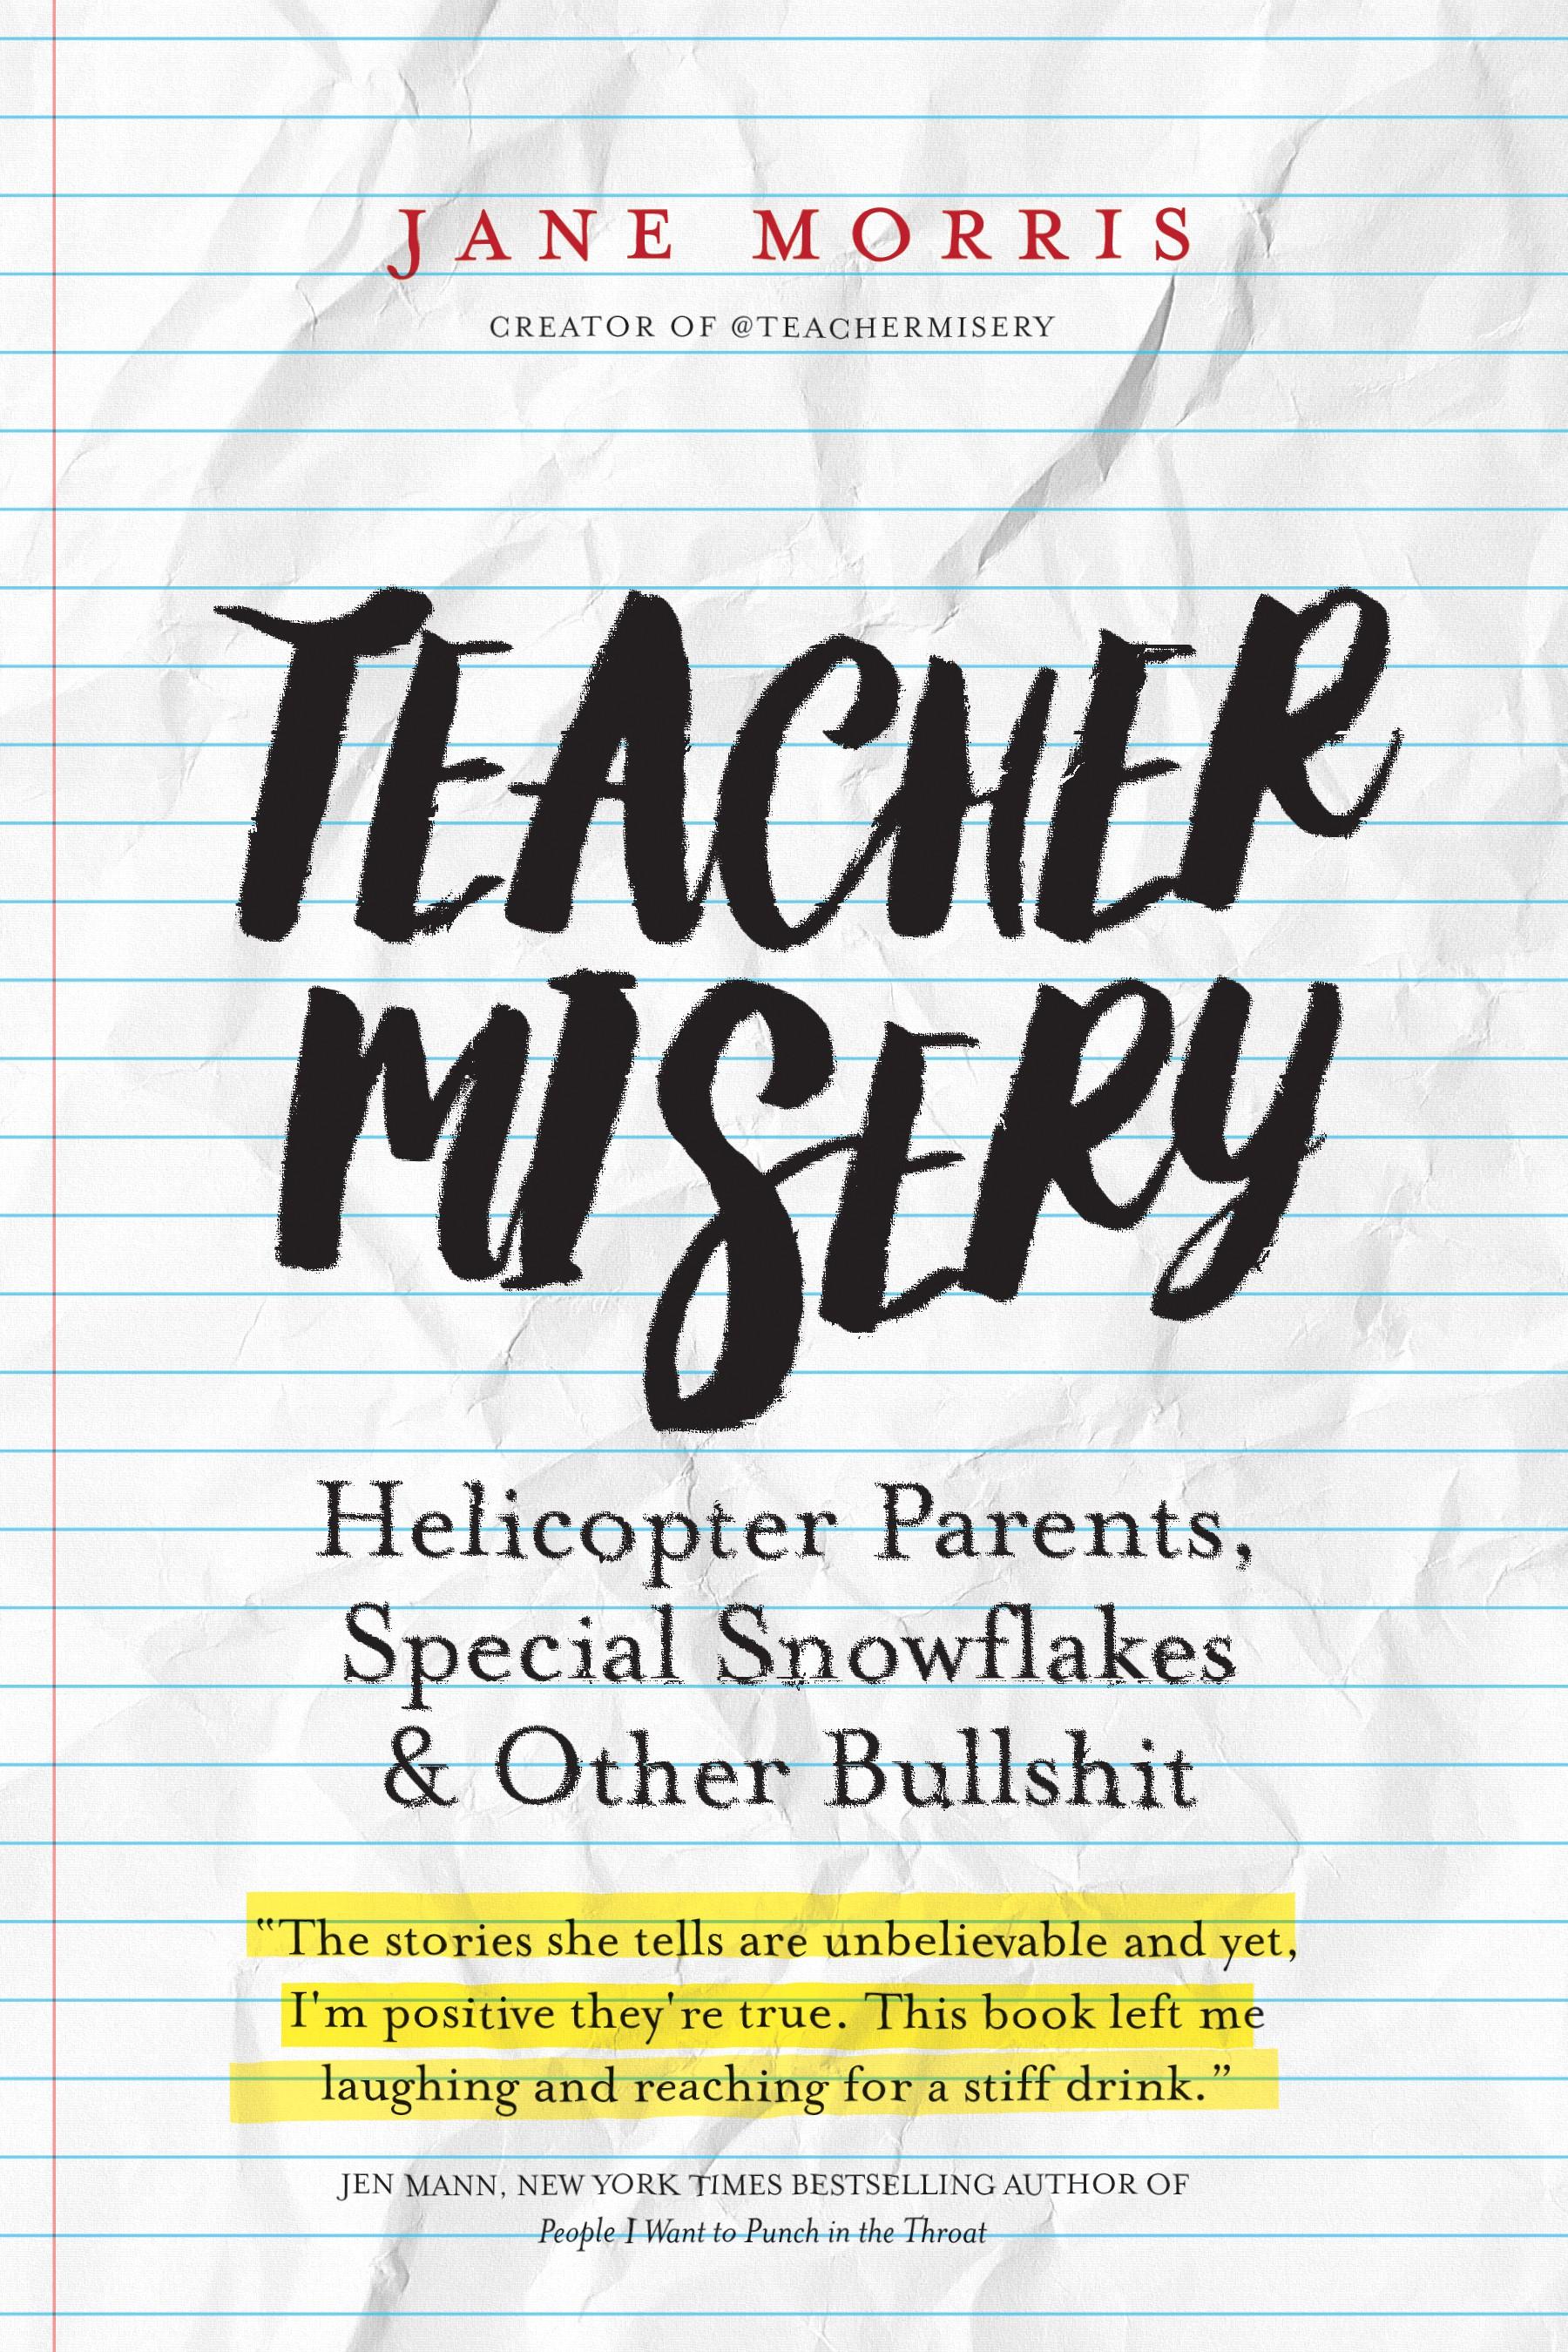 Stylish, creative, cool cover for Teacher Misery book